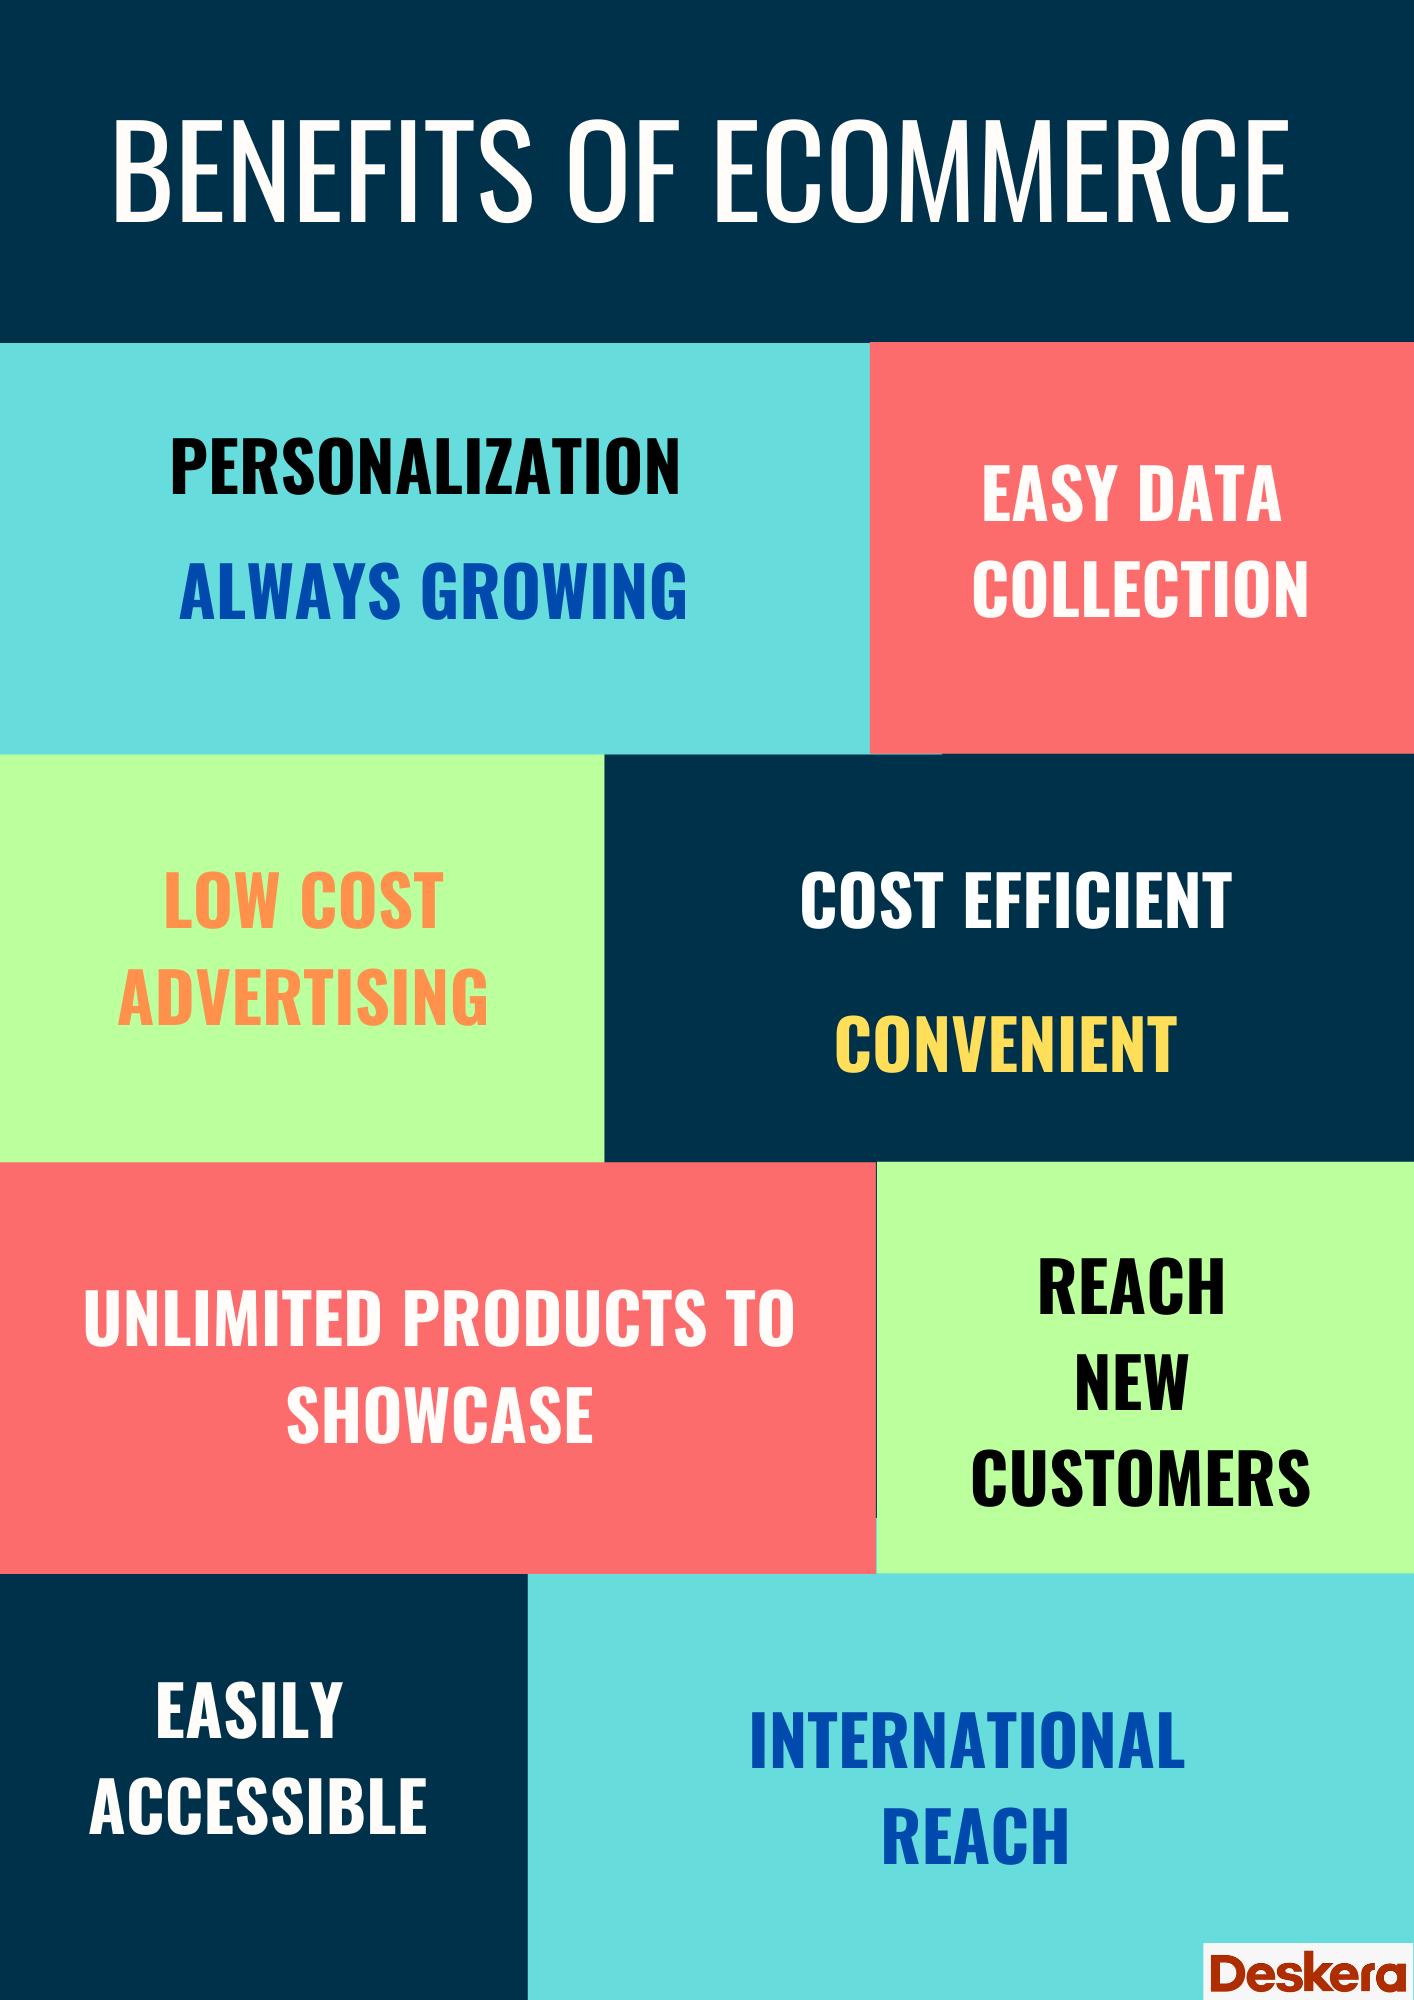 Benefits of eCommerce